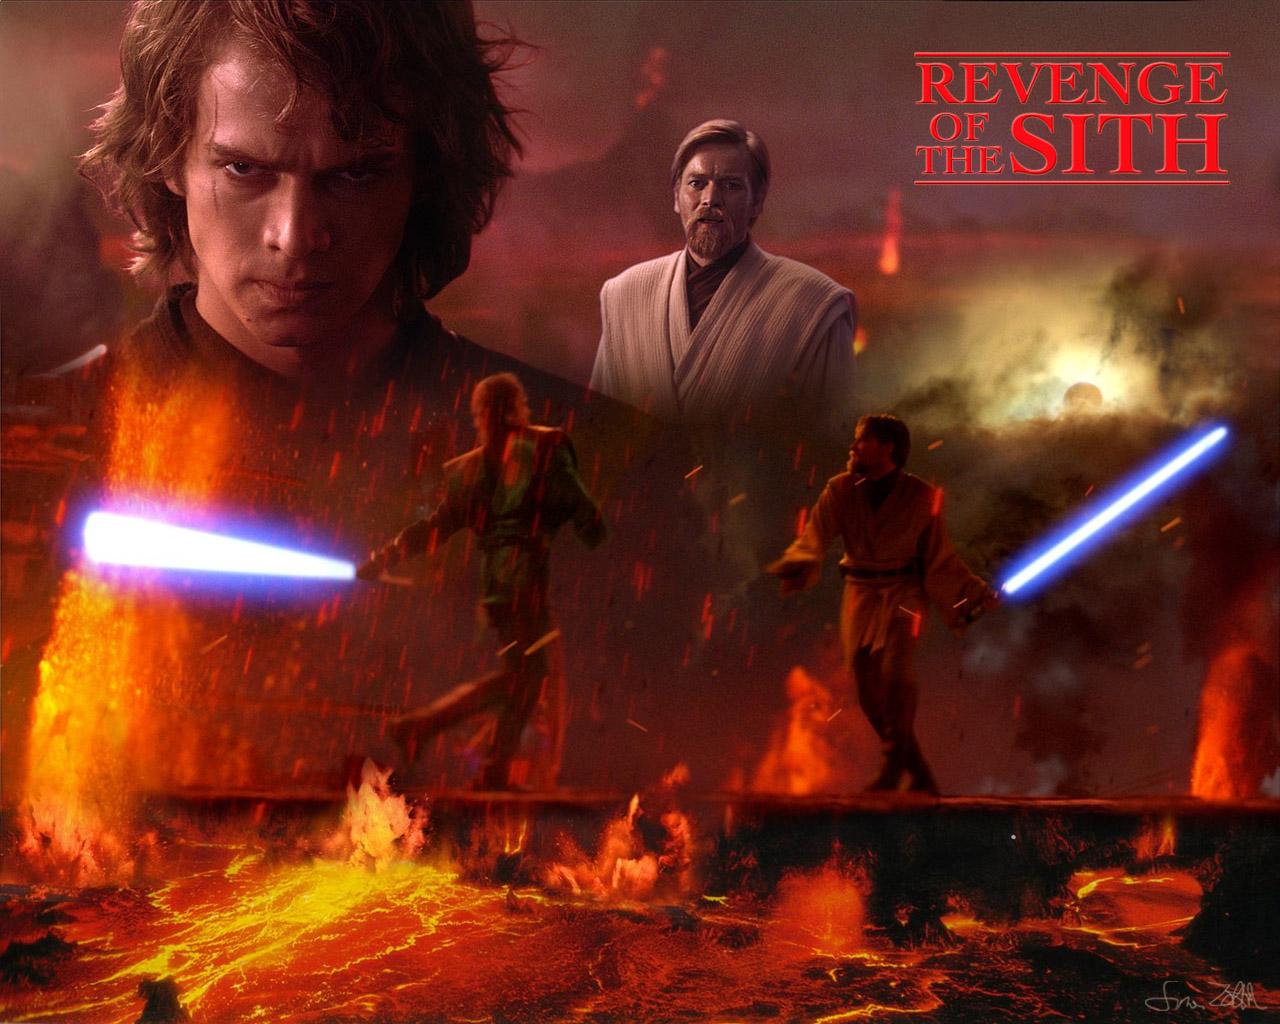 Bintang Wars Wallpaper - Star Wars Revenge Of The Sith , HD Wallpaper & Backgrounds